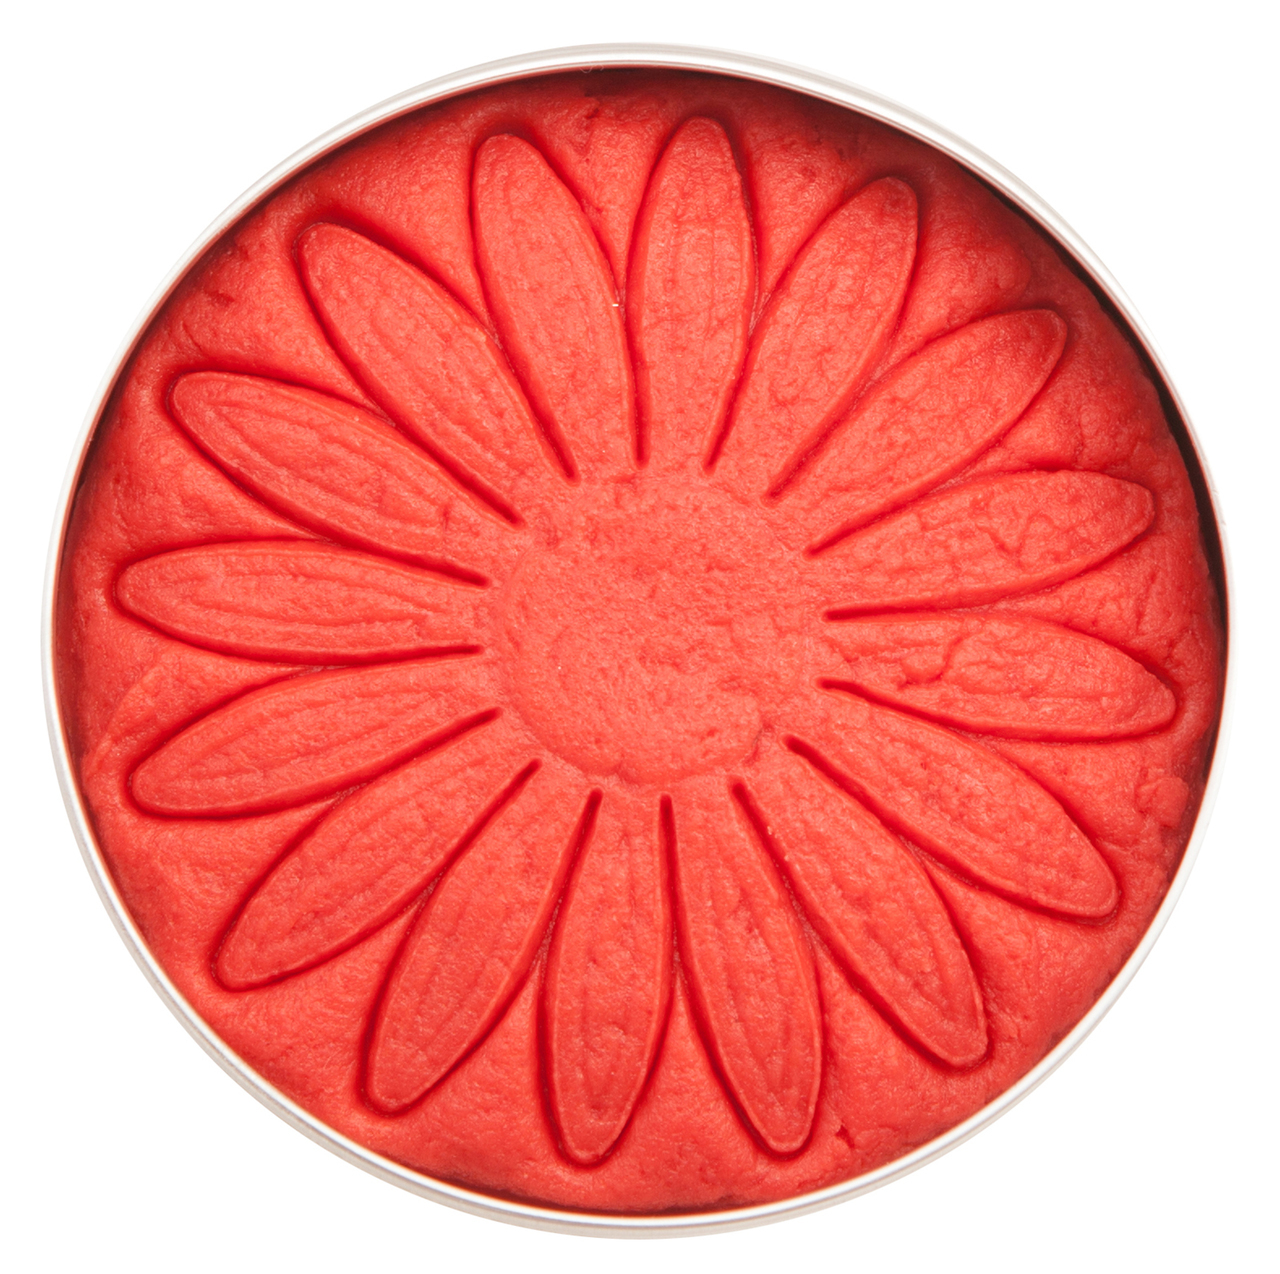 Dexterity Dough - 5 oz - Watermelon Red